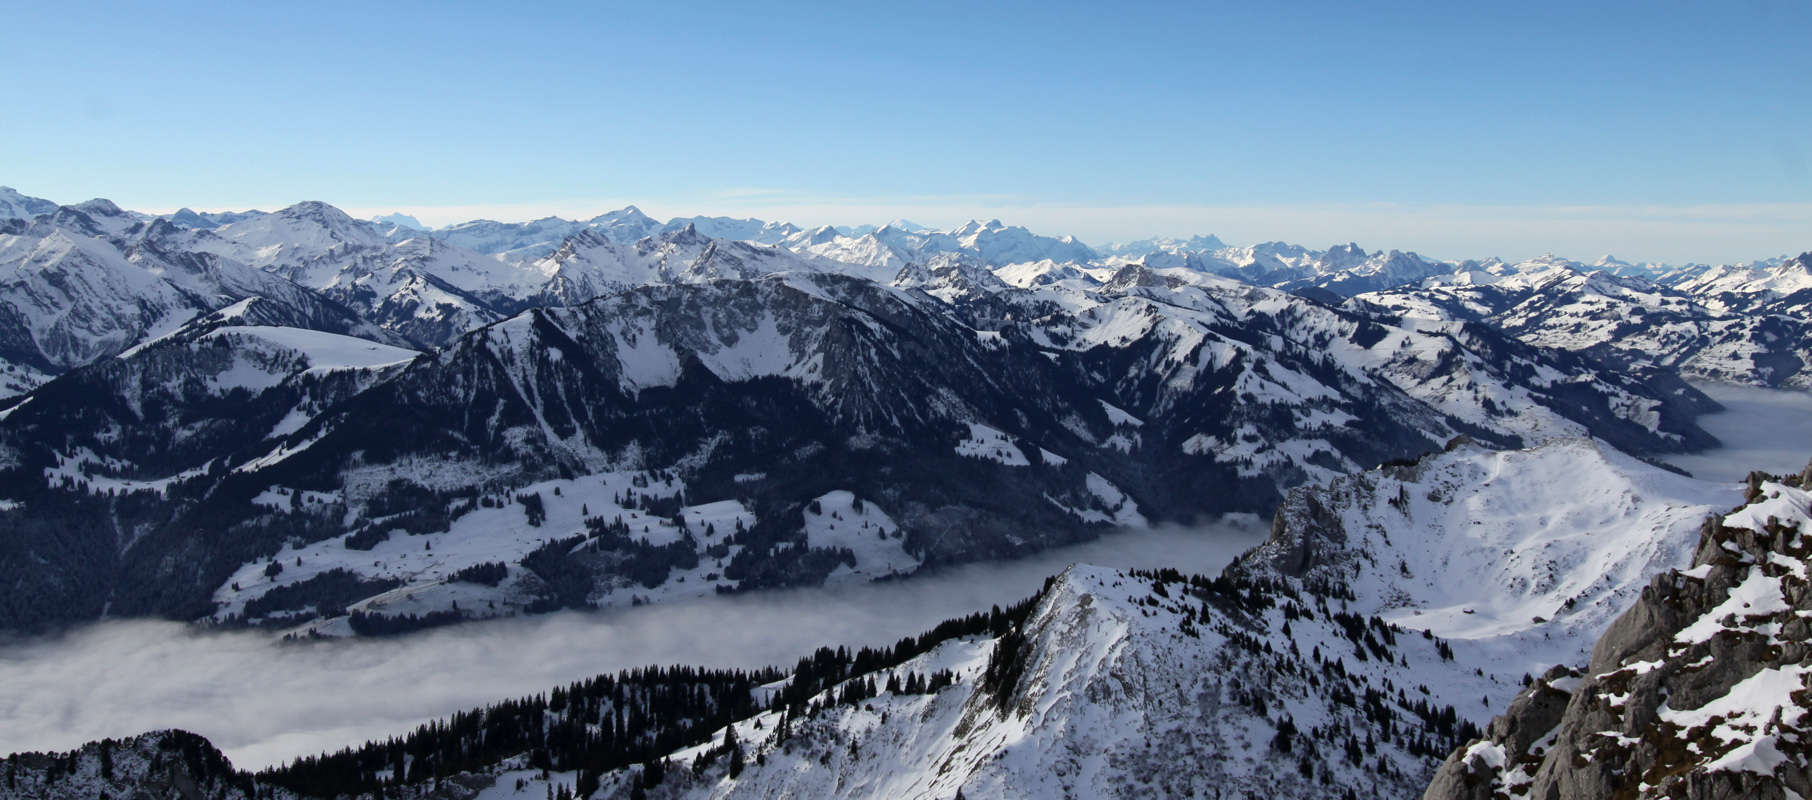 Panorama Nebelmeer Hinteres Simmental